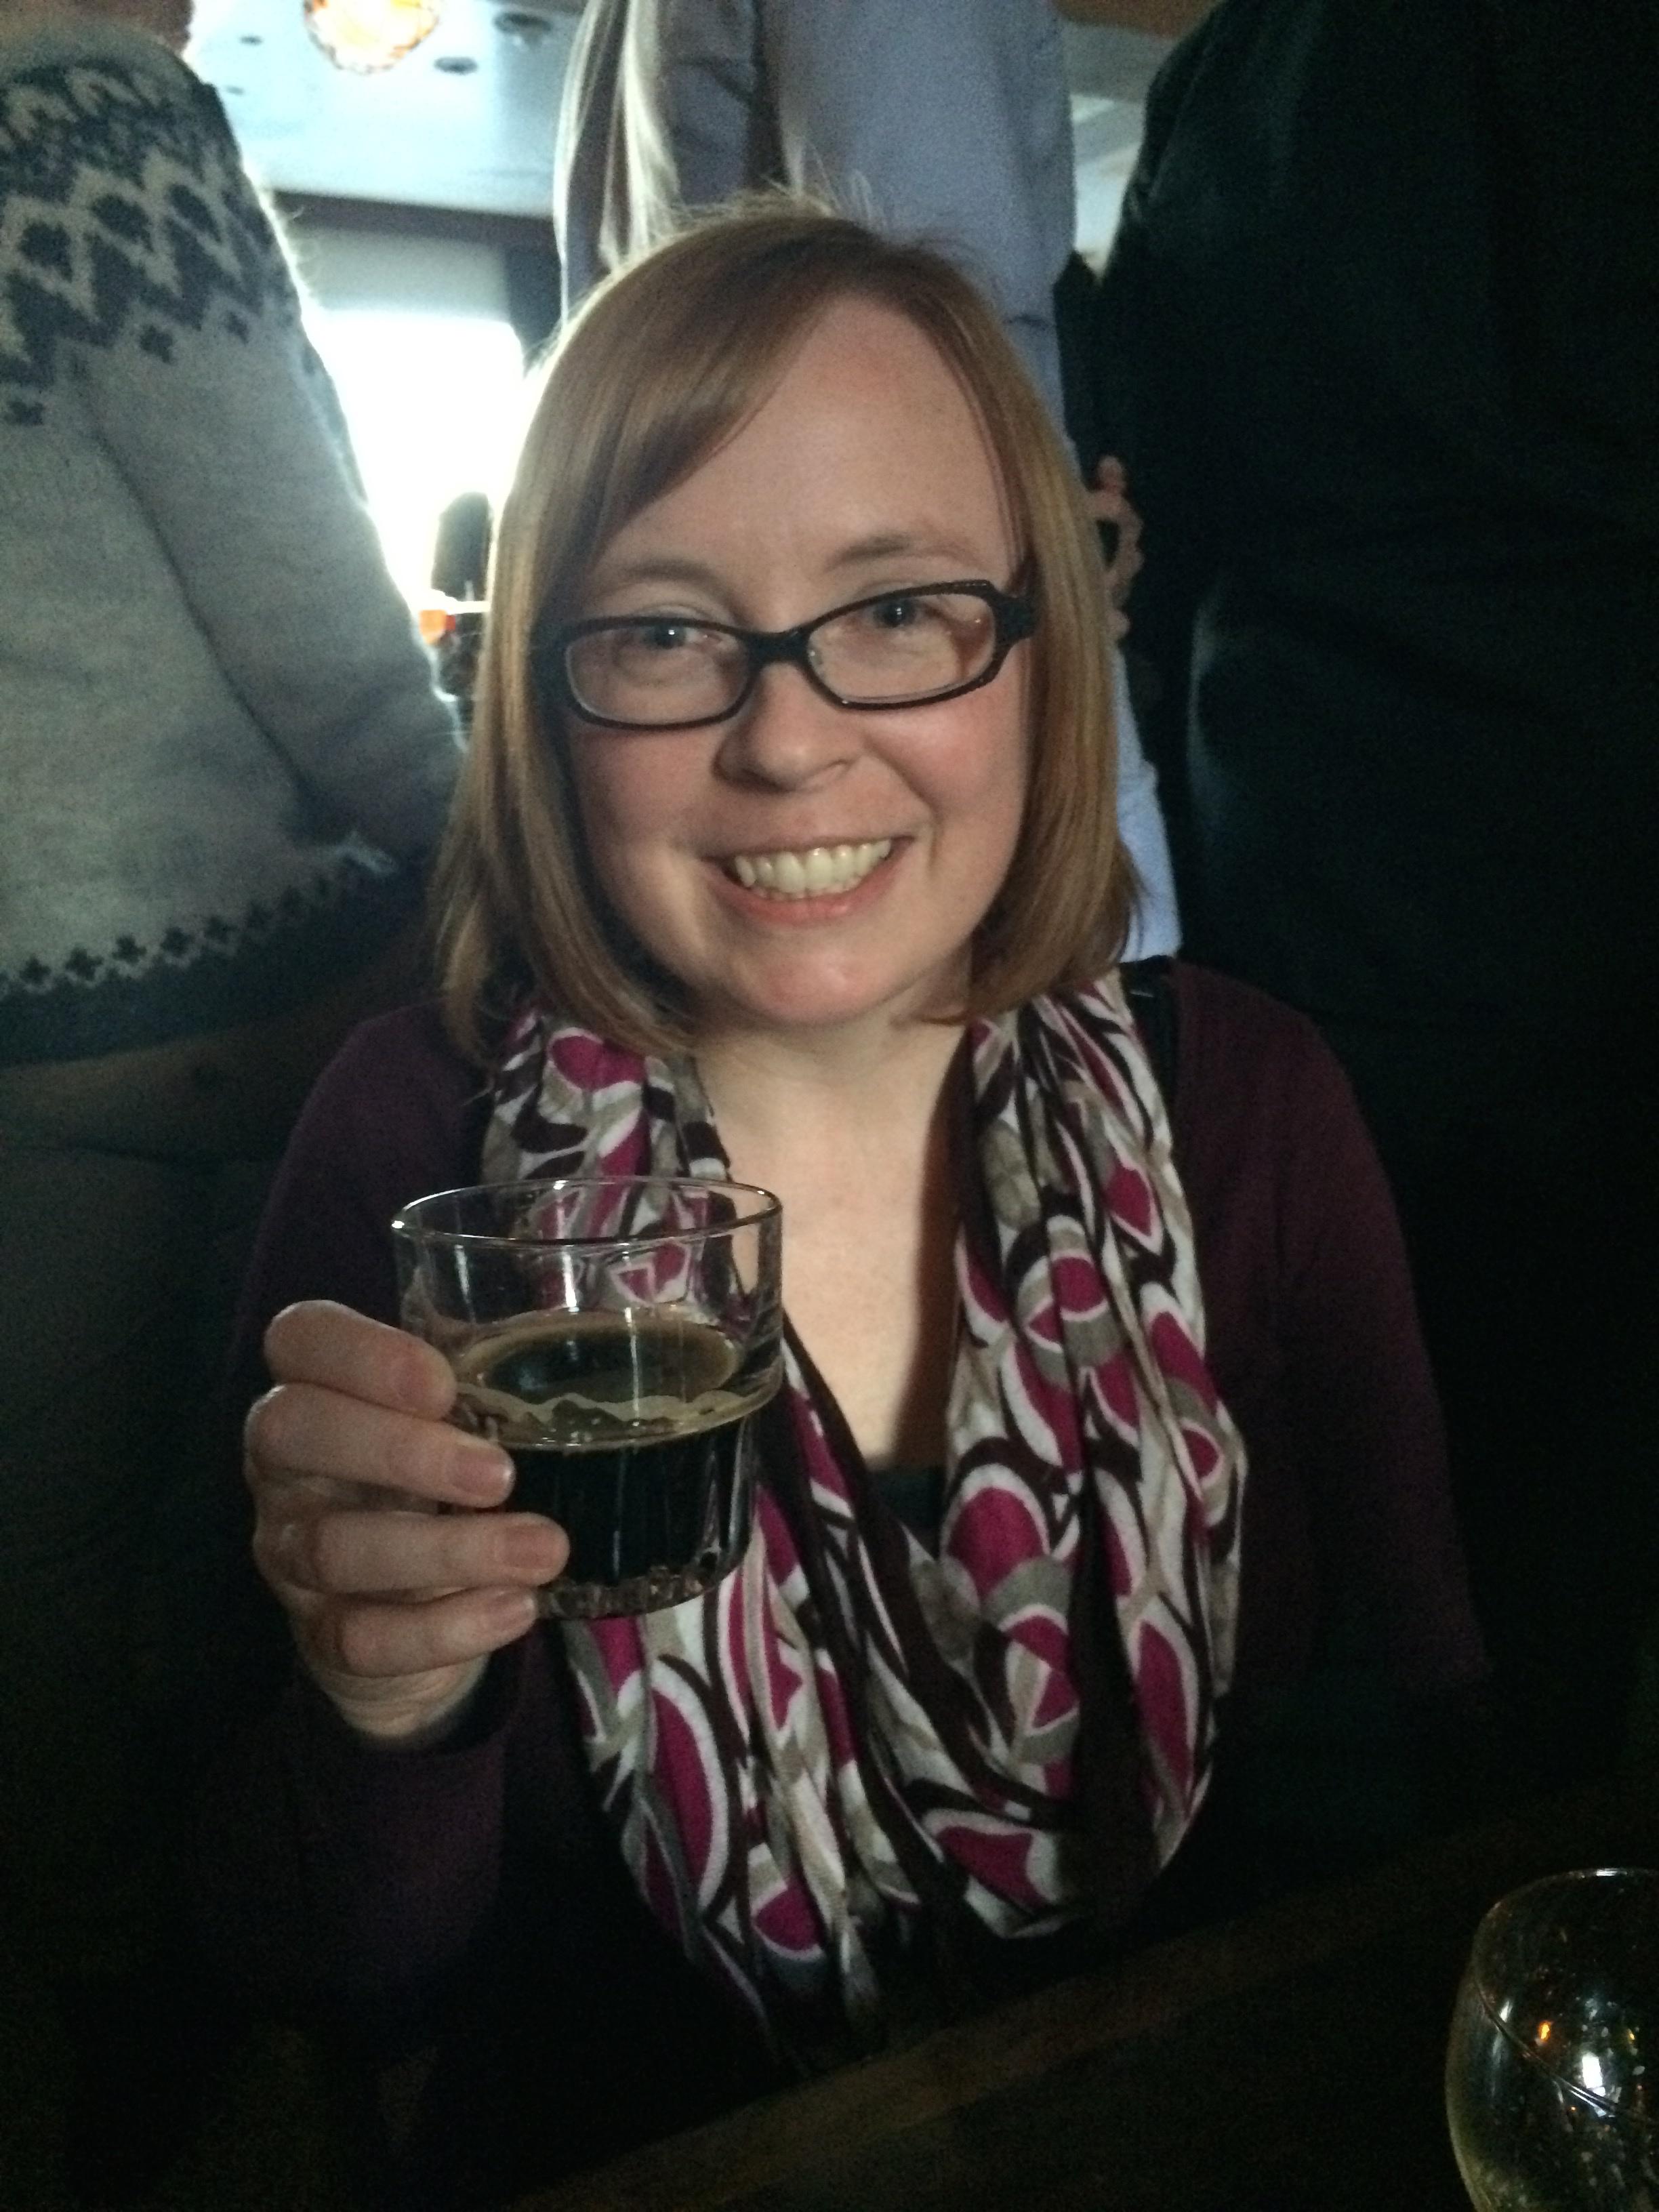 Cat Stelzer at the Icelandic Beer Fest